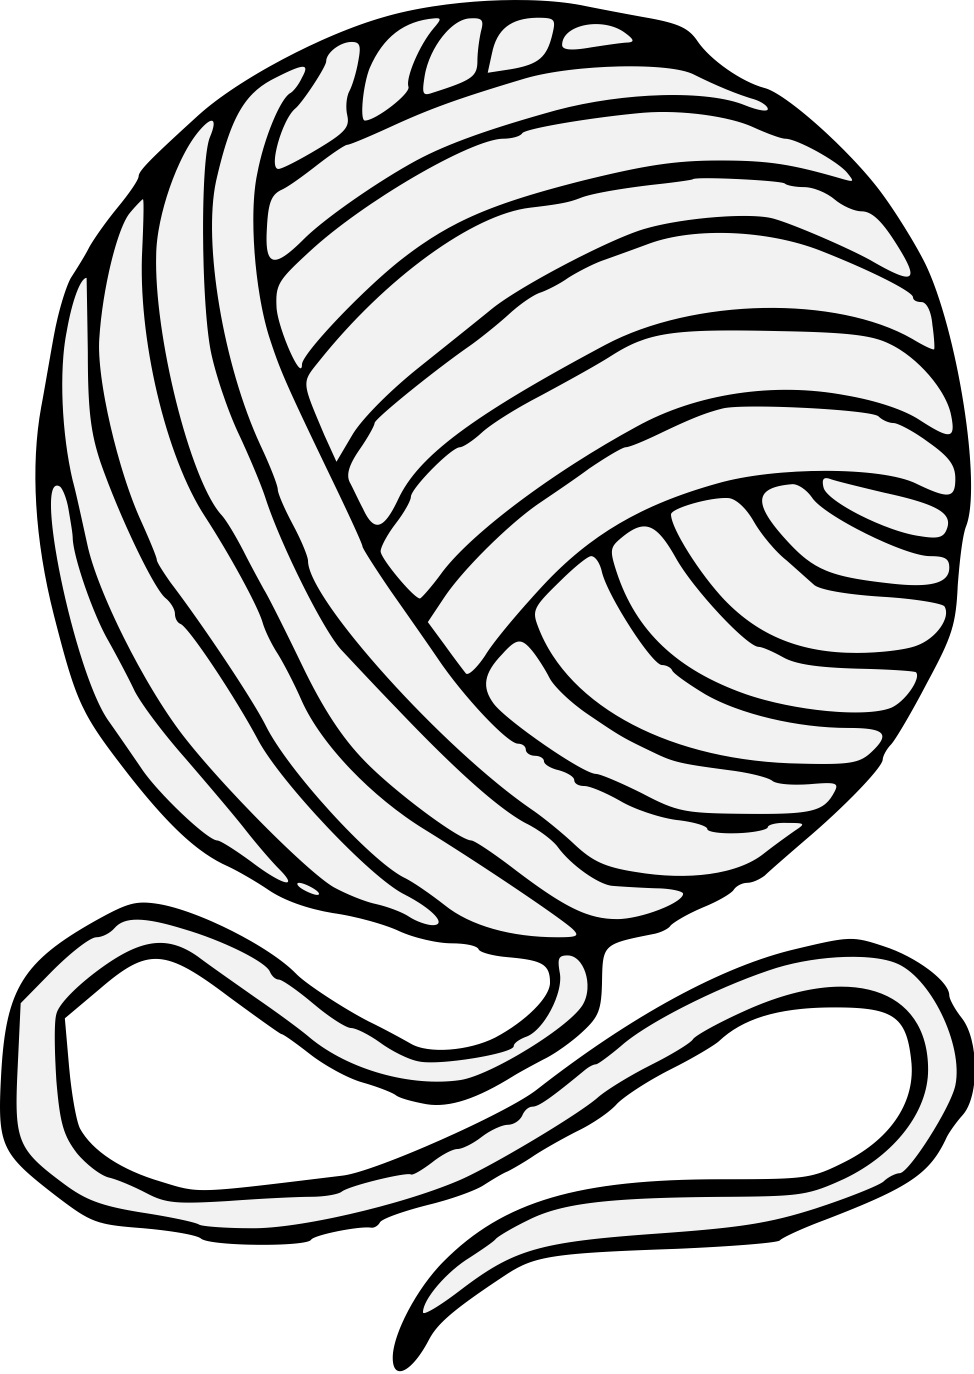 yarn traceable heraldic art